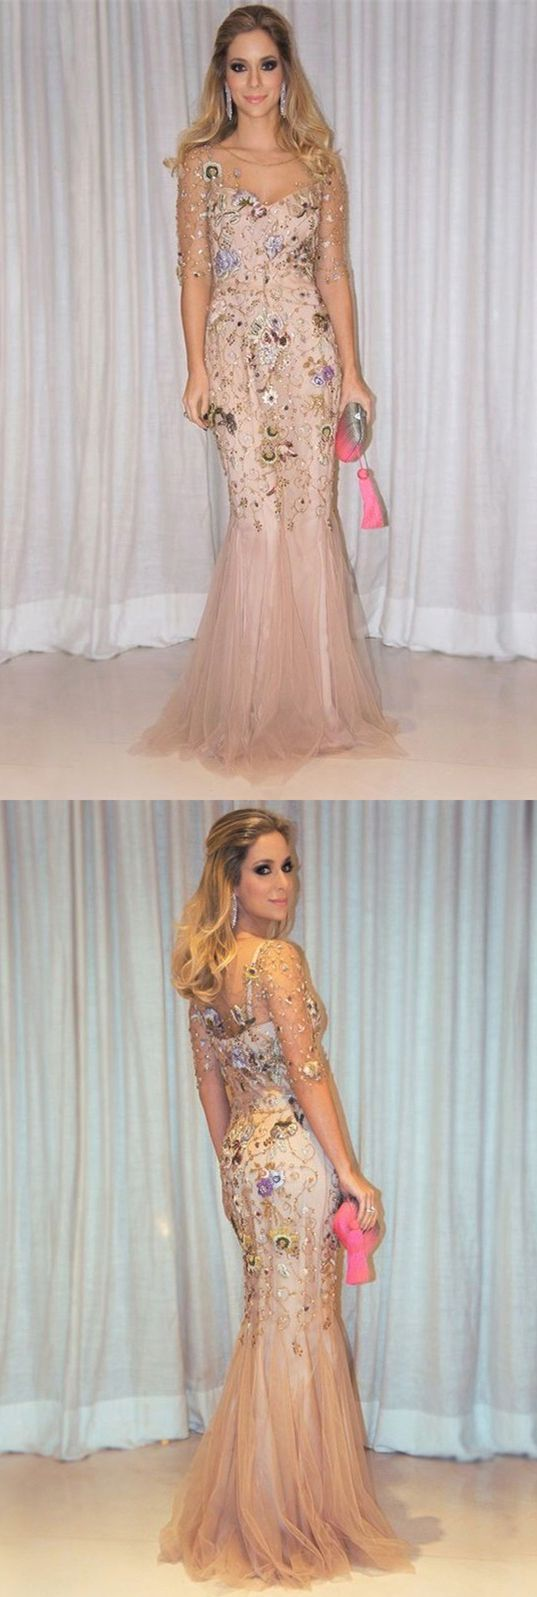 Mermaid prom dressesround neck prom dresseslight champagne prom